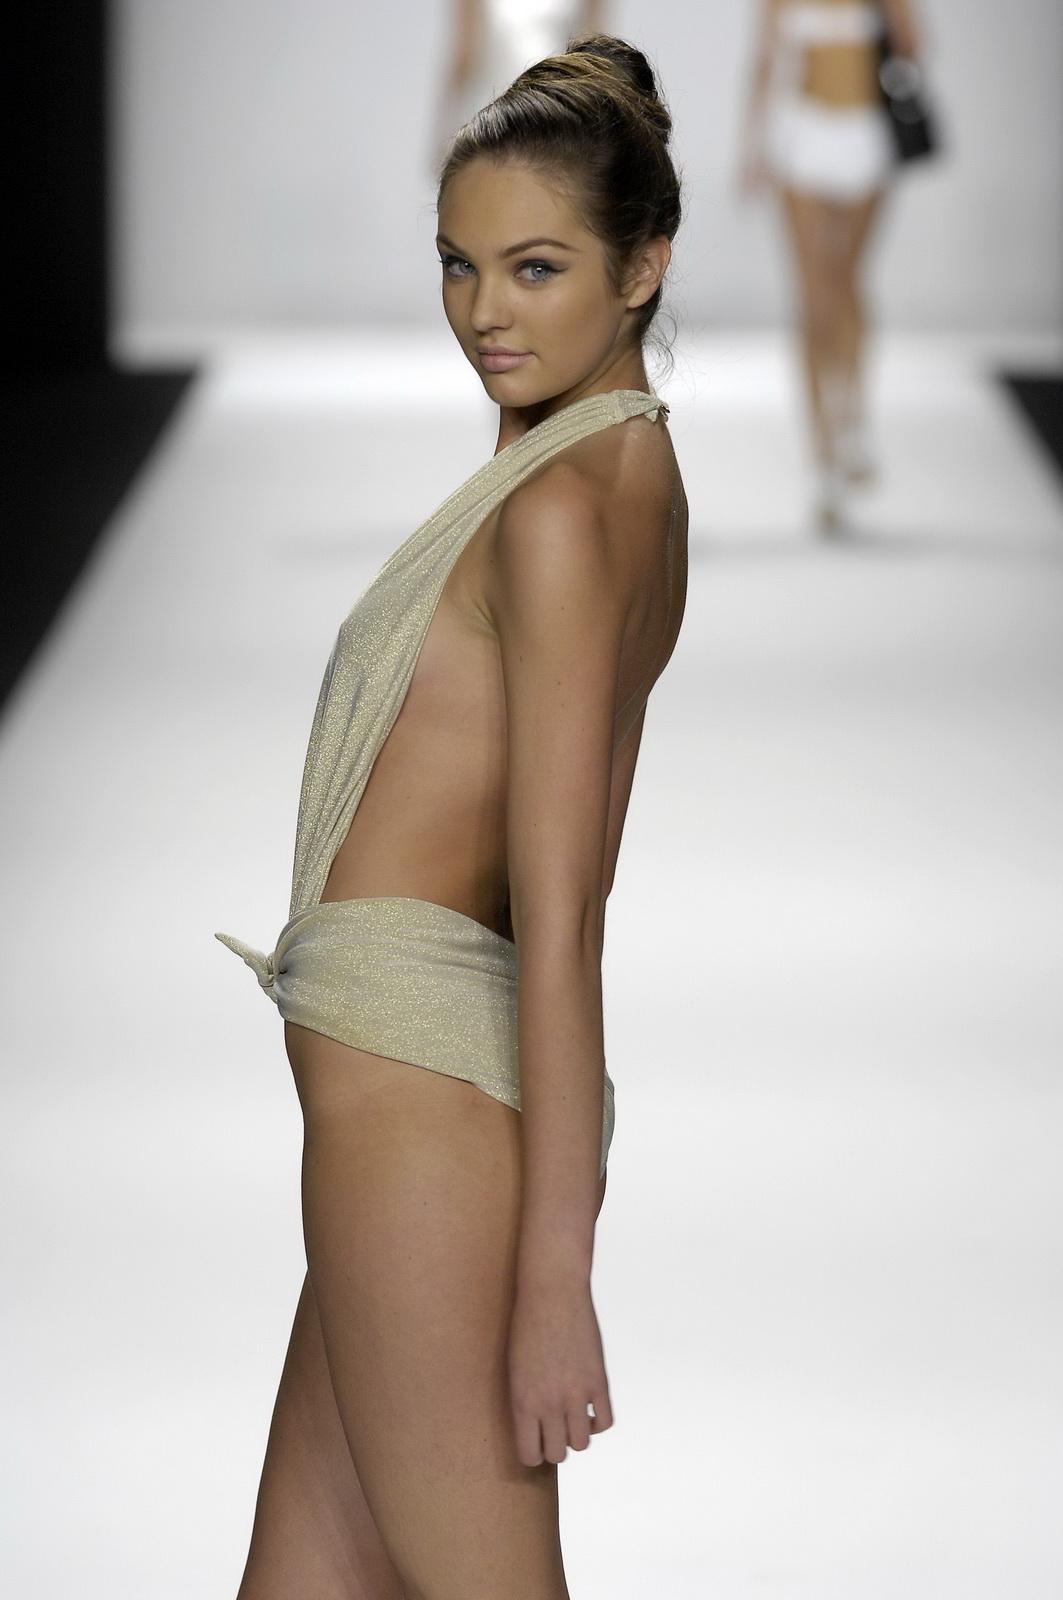 http://3.bp.blogspot.com/_NRGPIrDtEg8/TQsbAvsEfPI/AAAAAAAAAXc/fBzYhzczuqc/s1600/Candice_Swanepoel_supery_Bathing_Suit_3.jpg